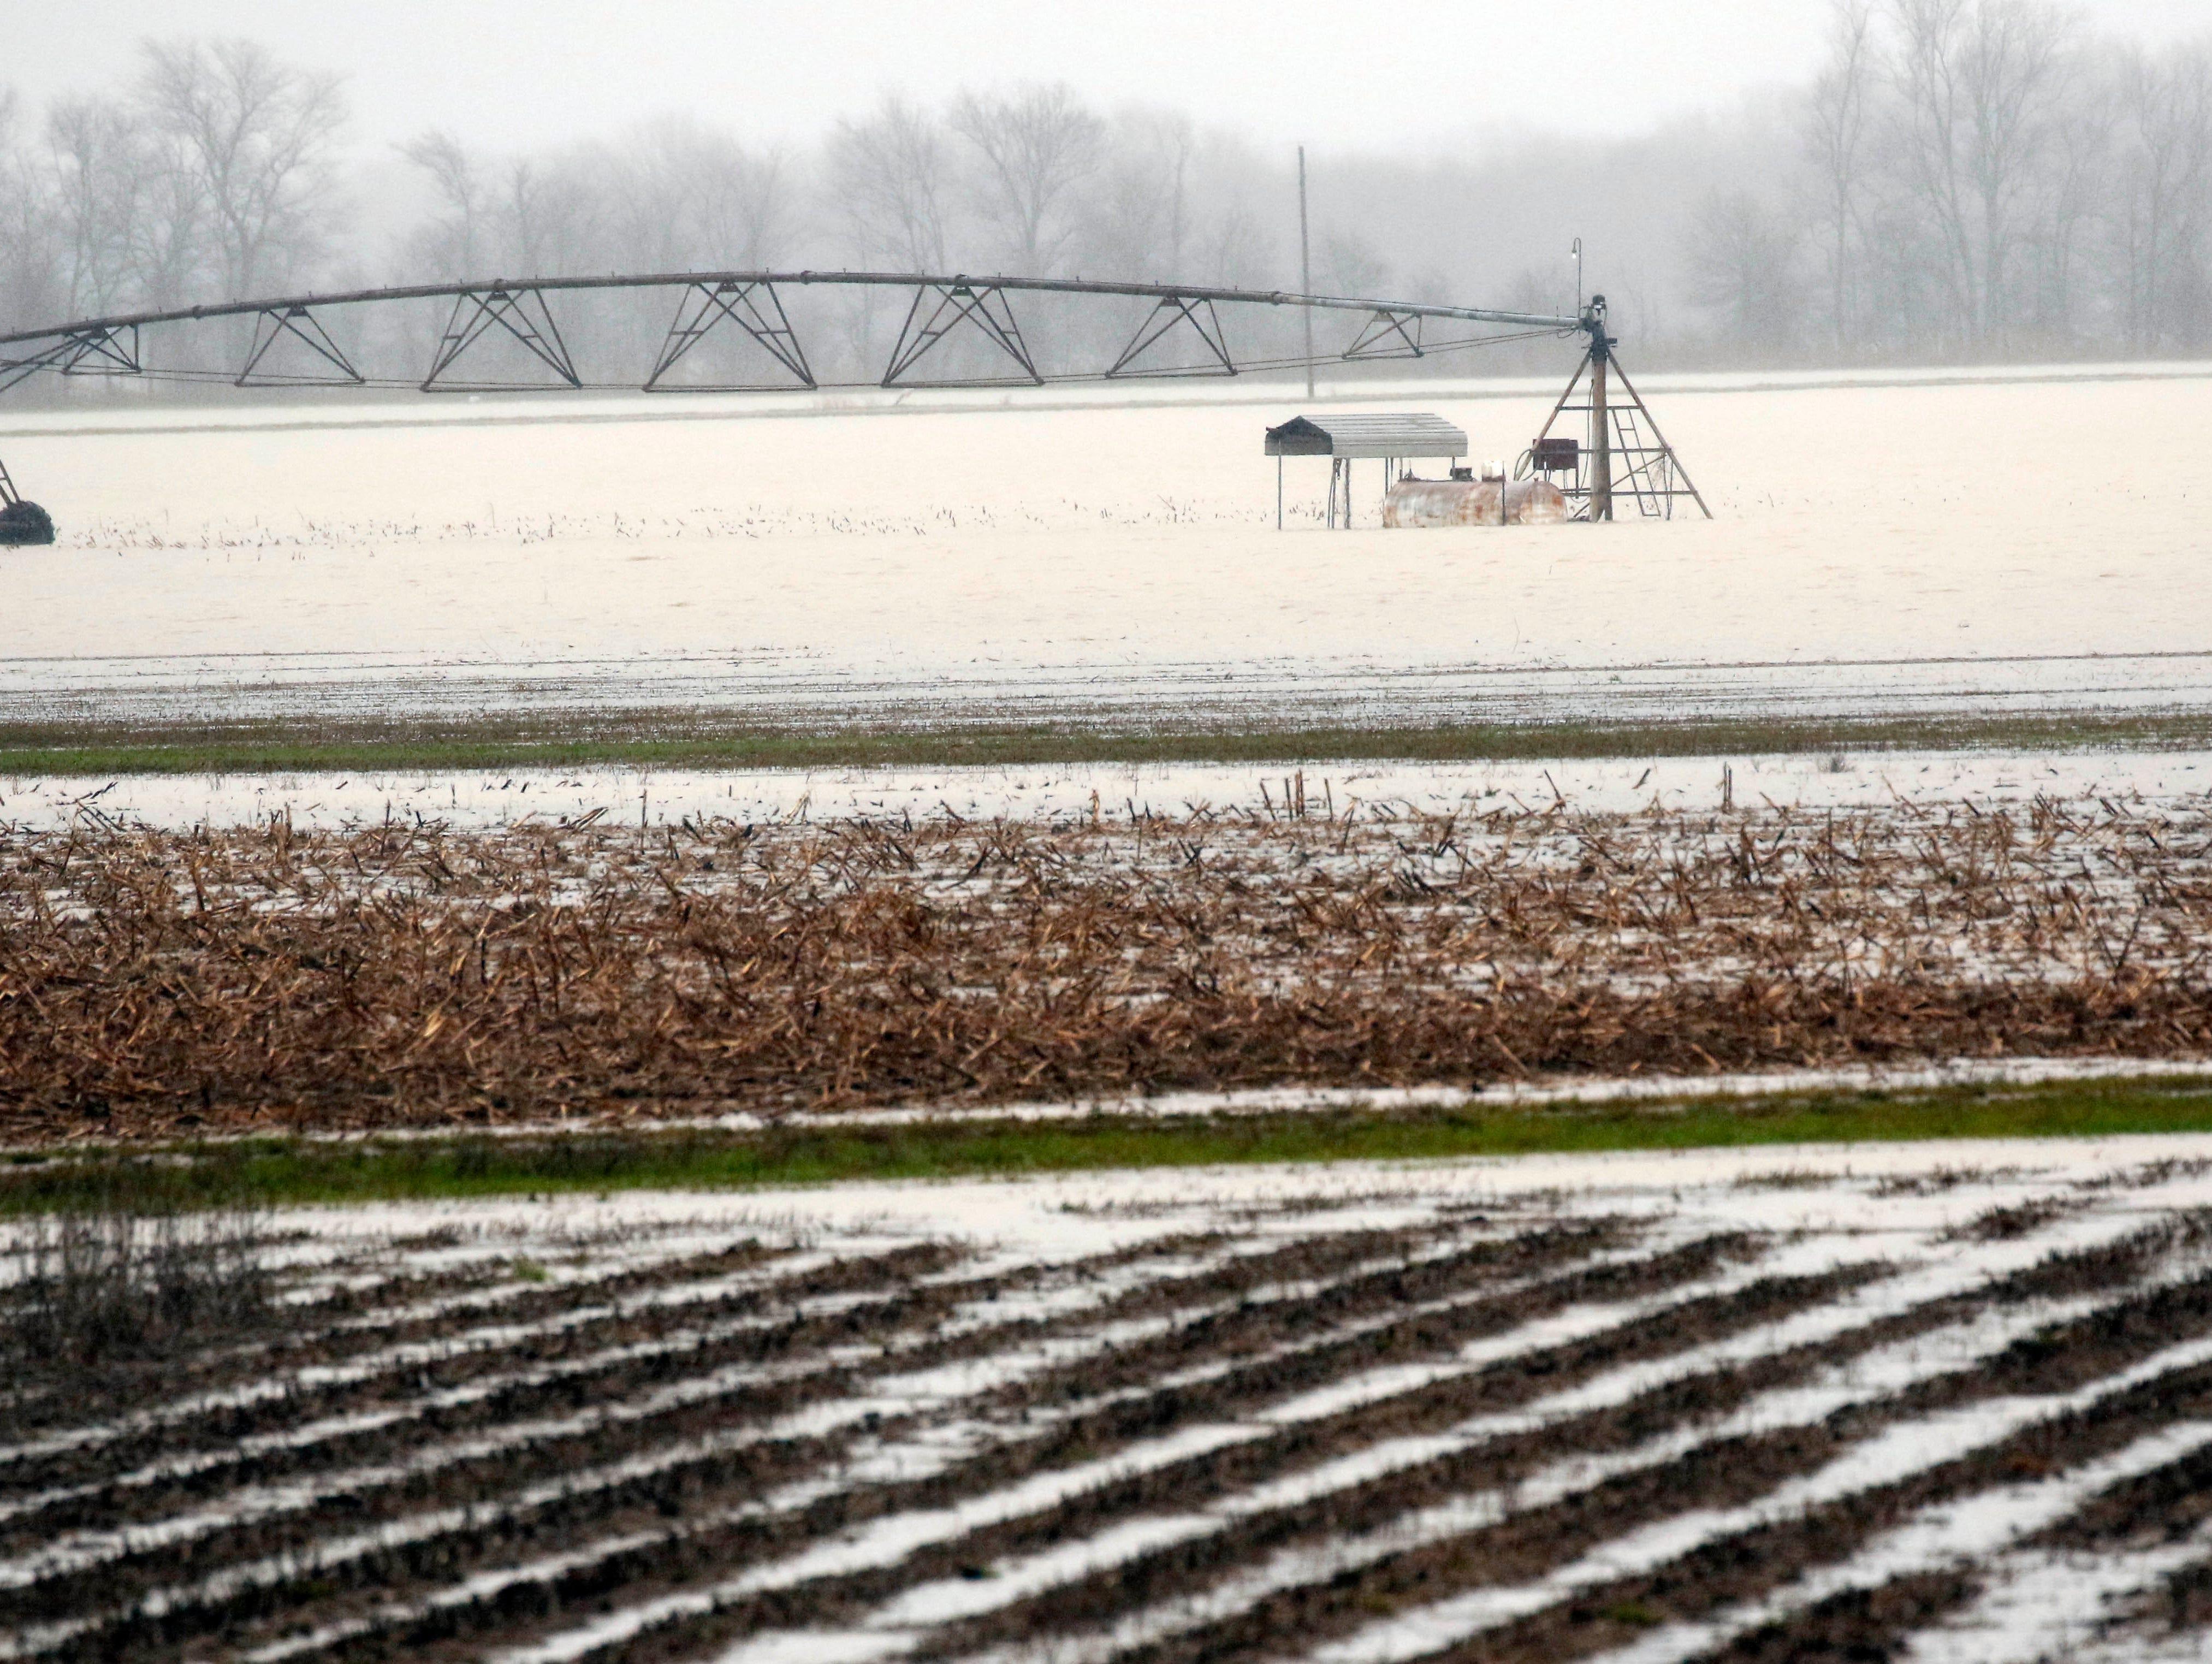 Backflow waters flood farmlands near Rolling Fork, Miss., Monday, March 11, 2019.